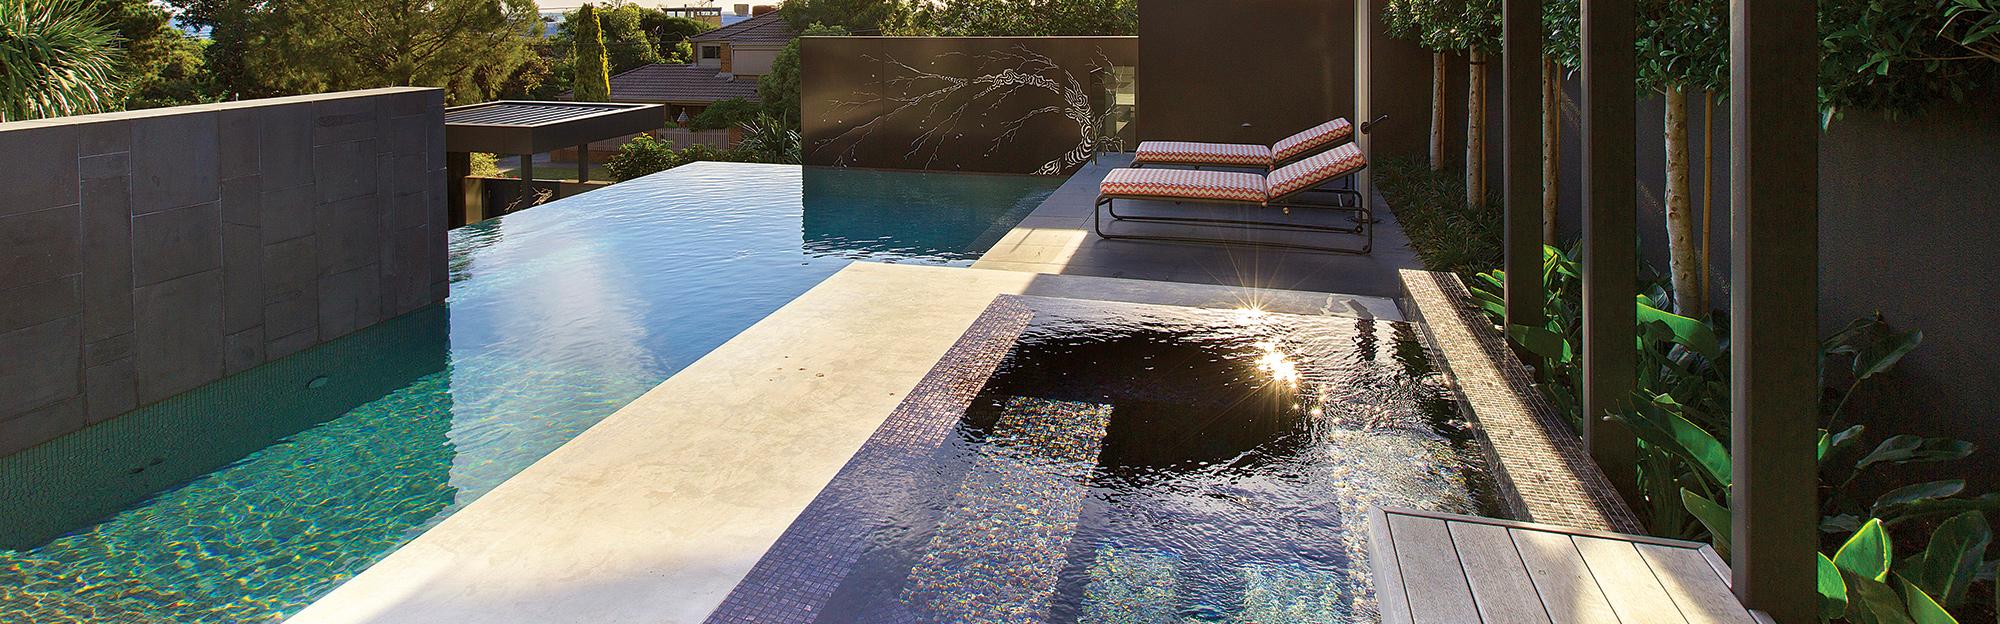 Bisazza Pool Mosaic Tiles